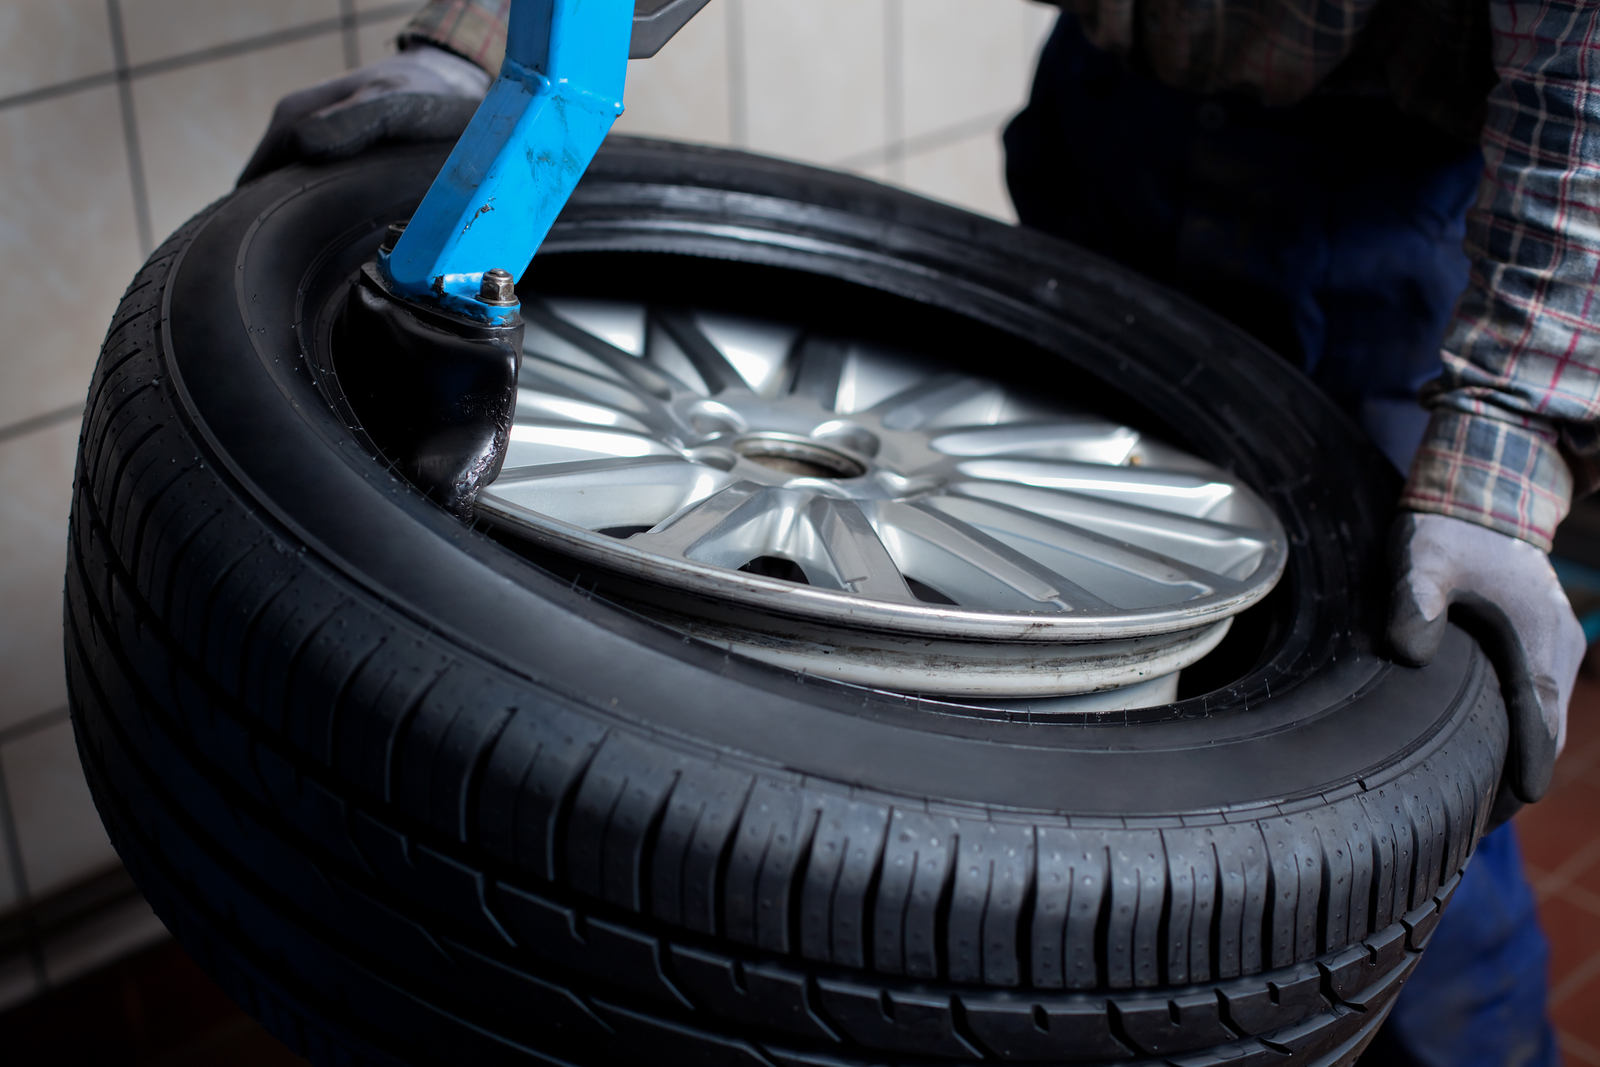 tires prestige auto repair 39 mine brook road bernardsville nj 07924 908 766 7667. Black Bedroom Furniture Sets. Home Design Ideas